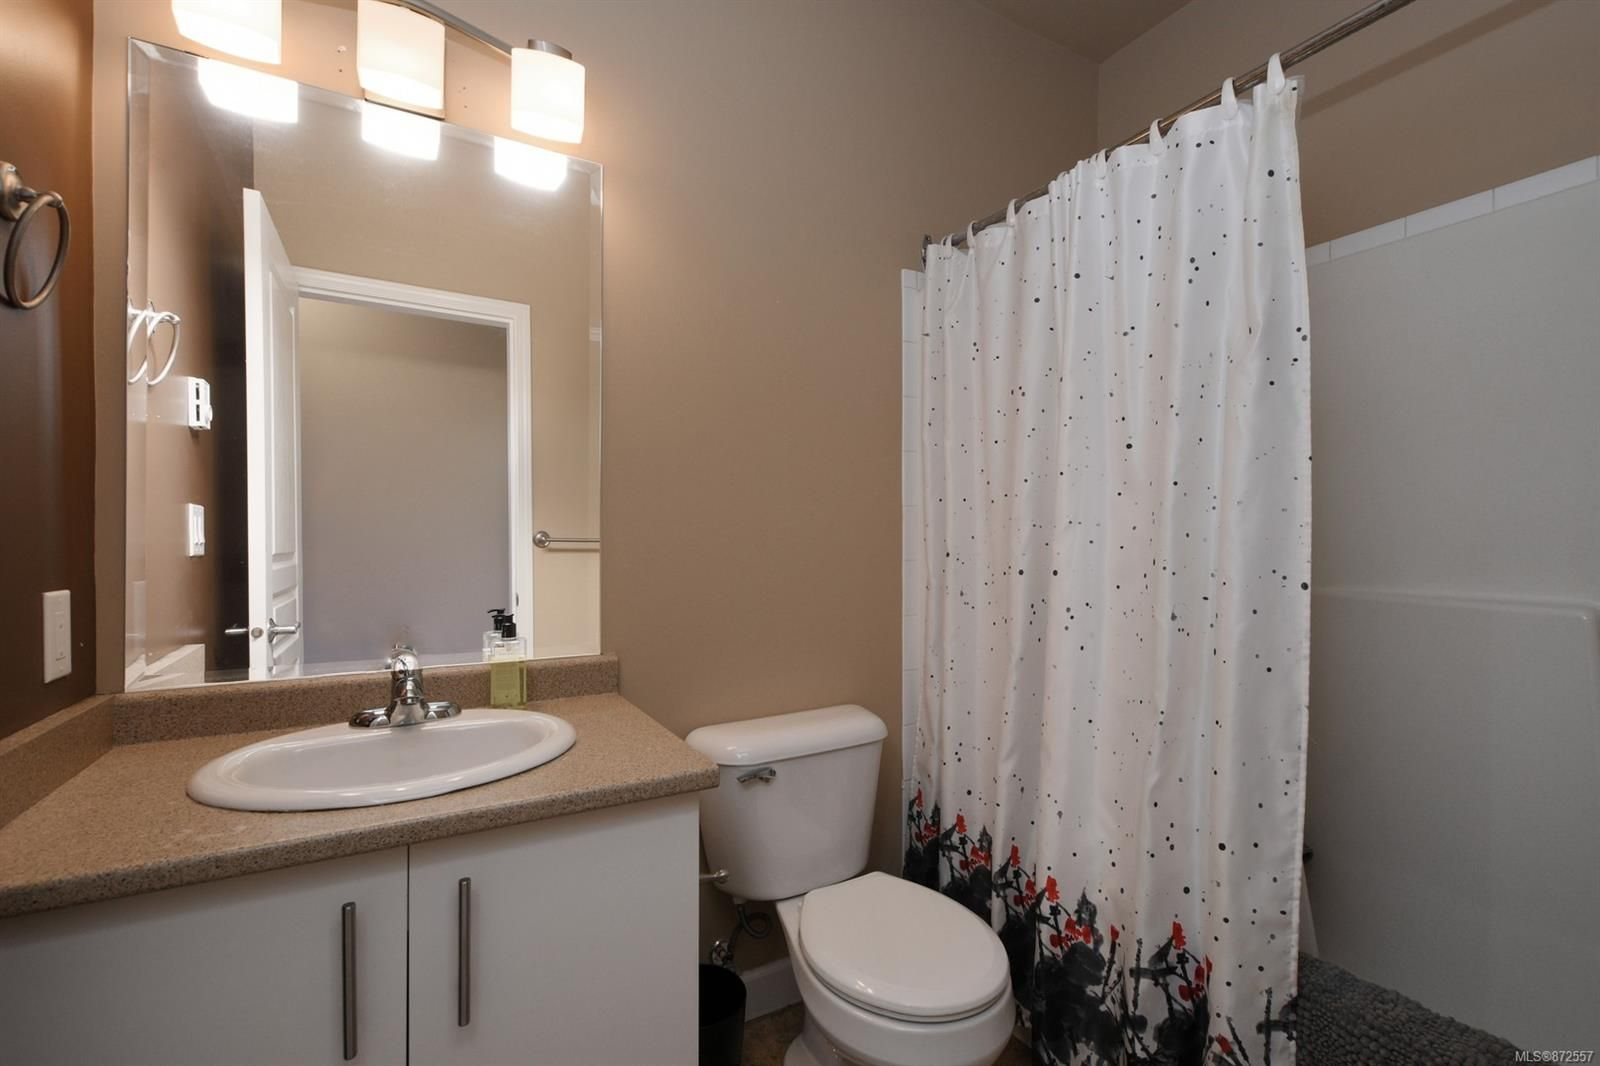 Photo 13: Photos: 411 825 Goldstream Ave in : La Langford Proper Condo for sale (Langford)  : MLS®# 872557